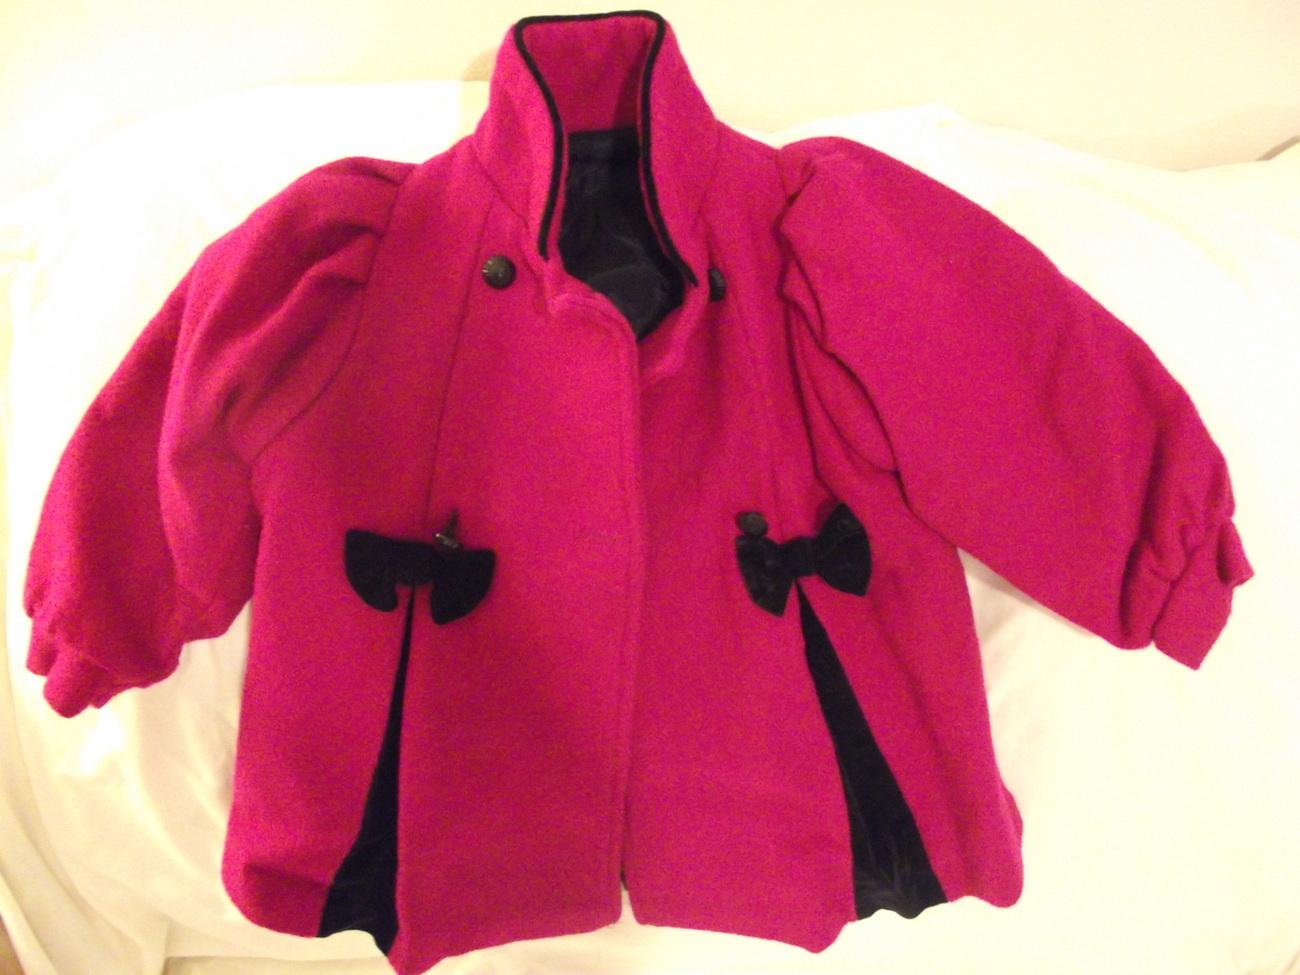 Toddler 3T dress coat